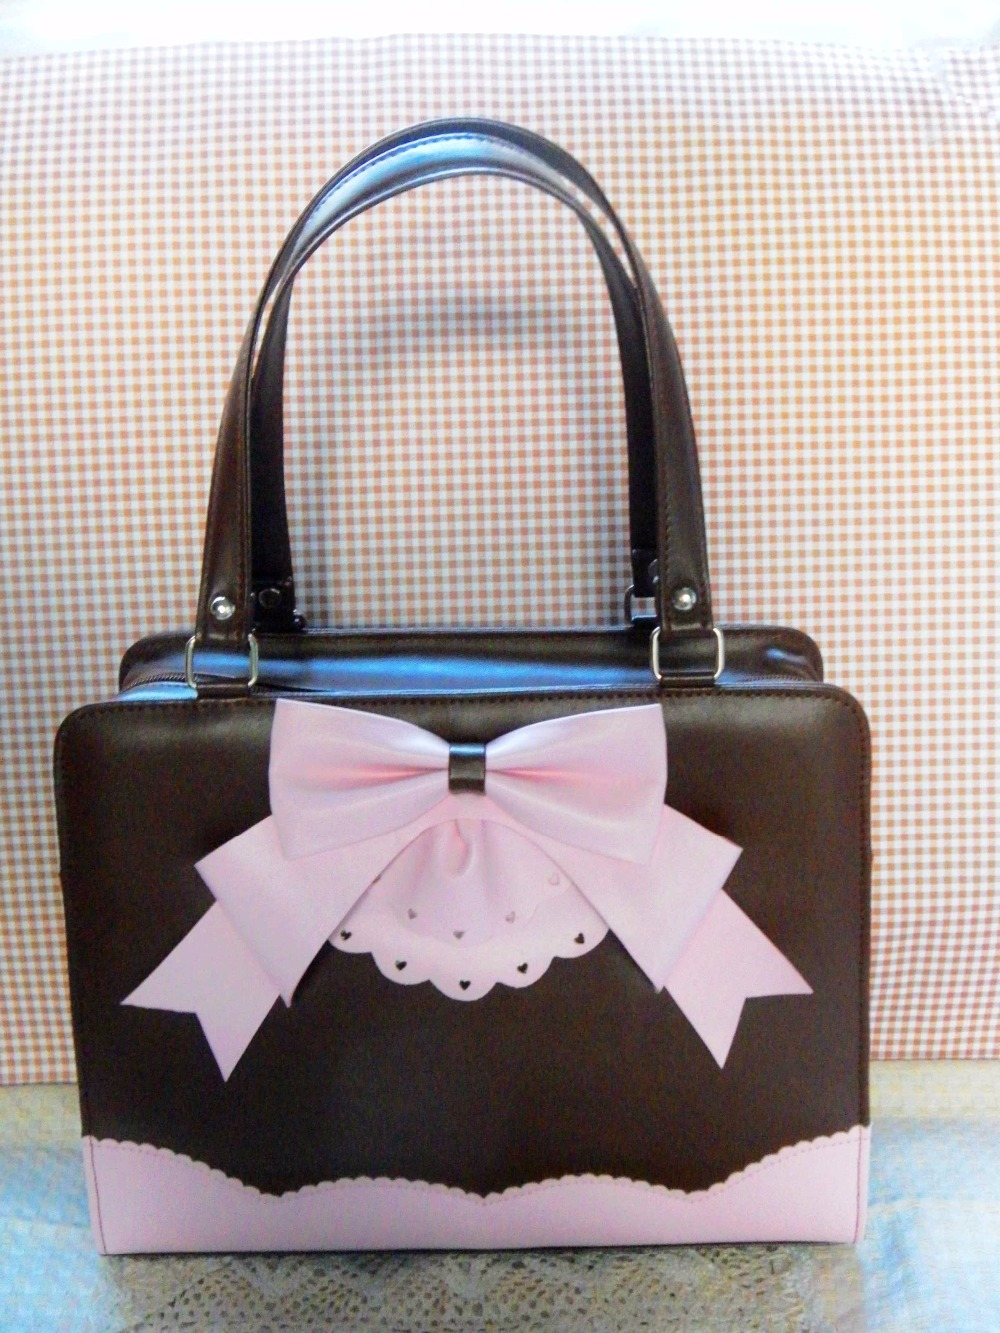 2de31522a8 Princess sweet lolita handbag loris Japanese sweet soft sister adorable  cute students cake butterfly handbag women loris035-in Top-Handle Bags from  Luggage ...